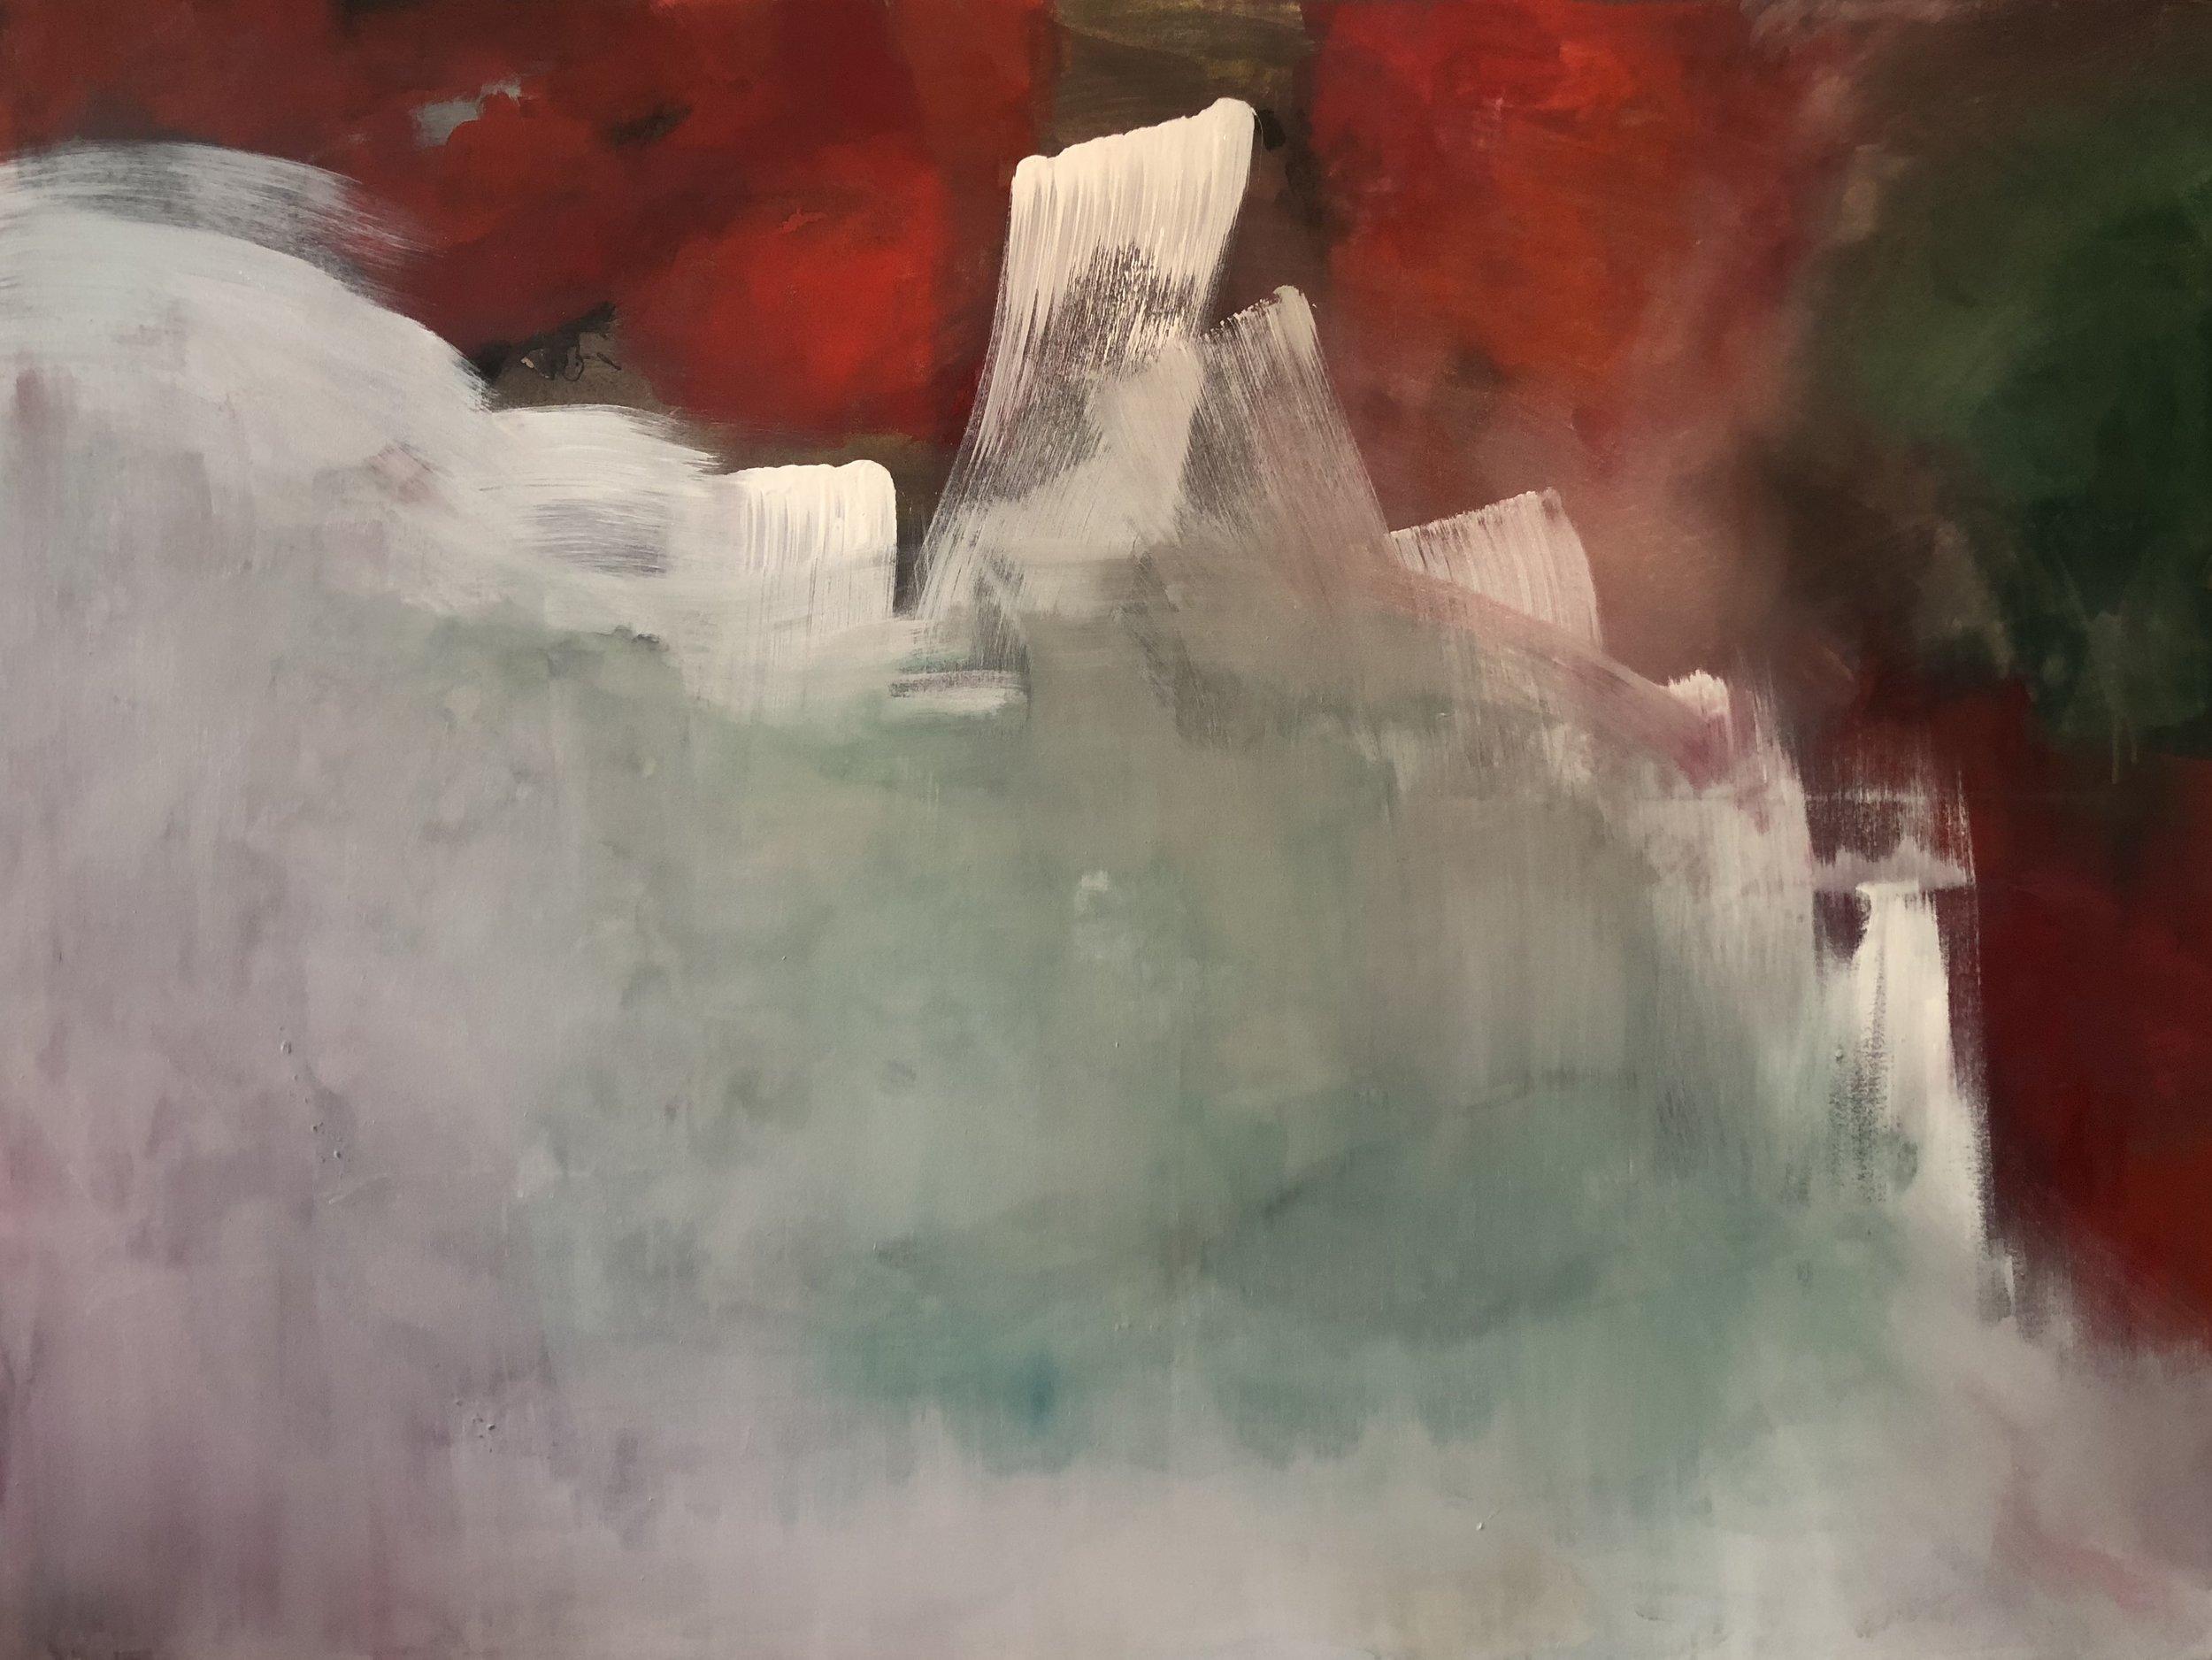 Untitled, 145 cm x 100 cm, Acrylic on canvas